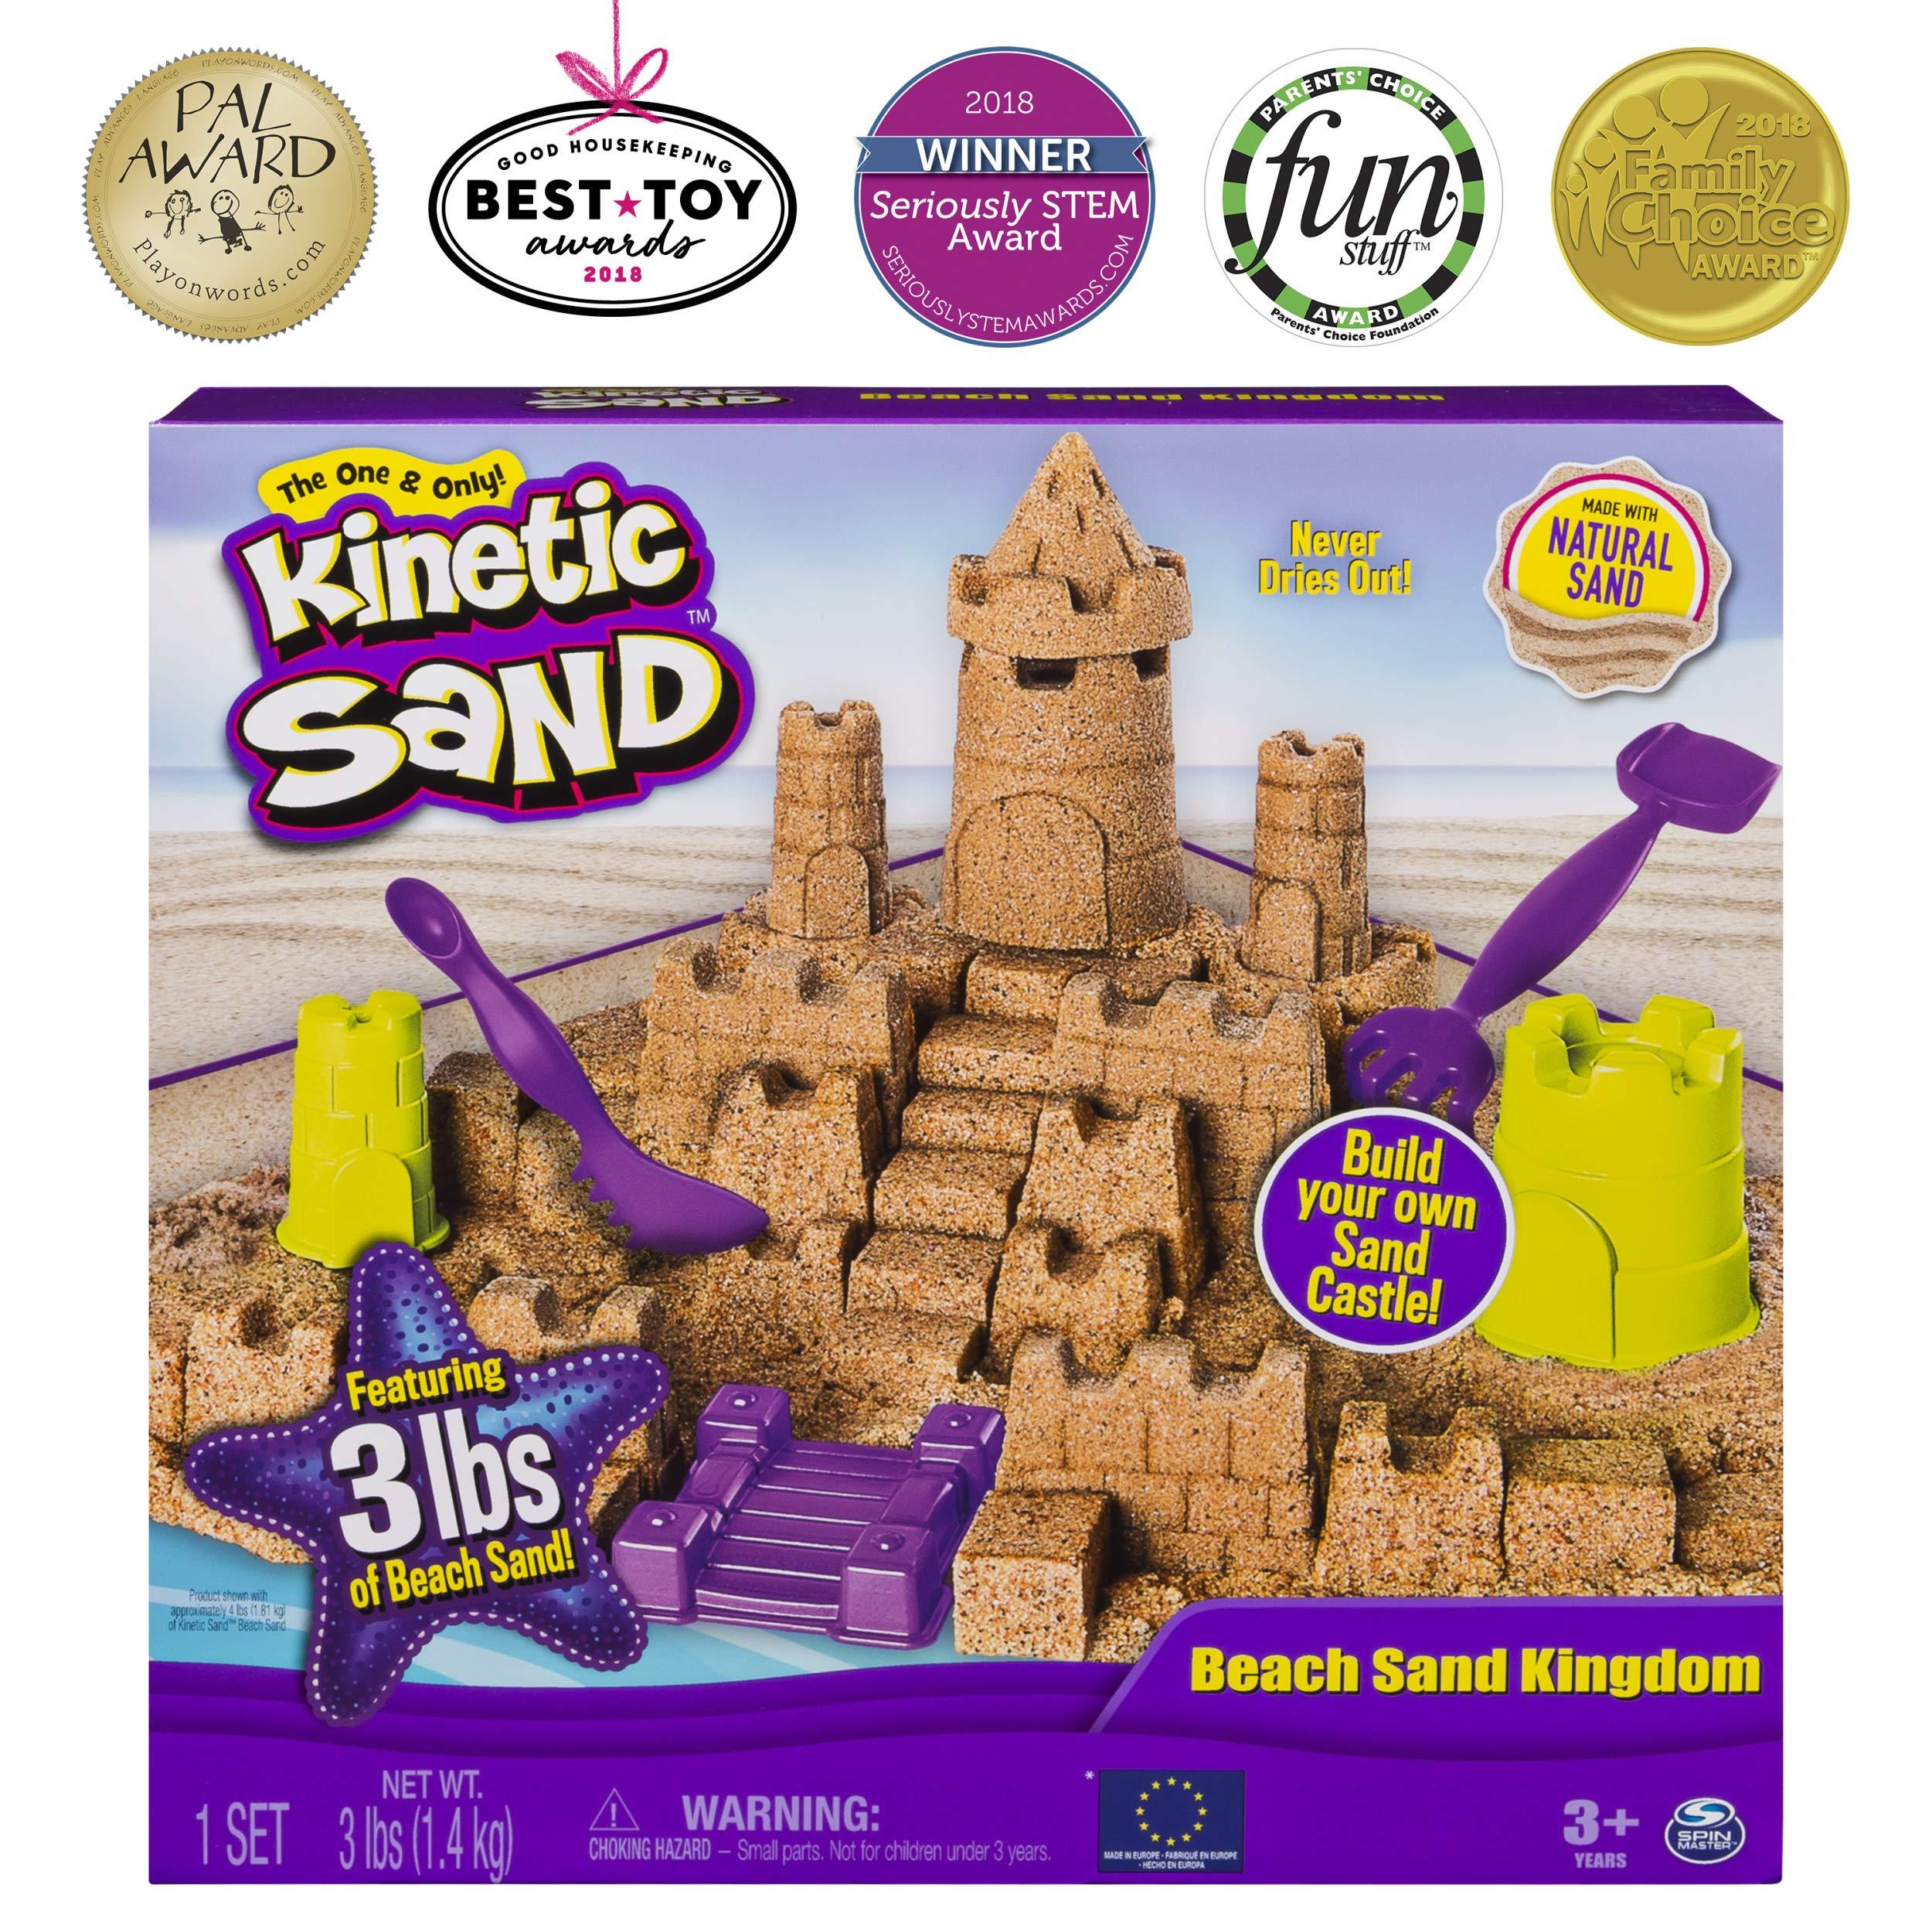 Kinetic Sand Beach Sand Kingdom Playset with 3lbs of Beach Sand, for Ages 3 and Up by Kinetic Sand